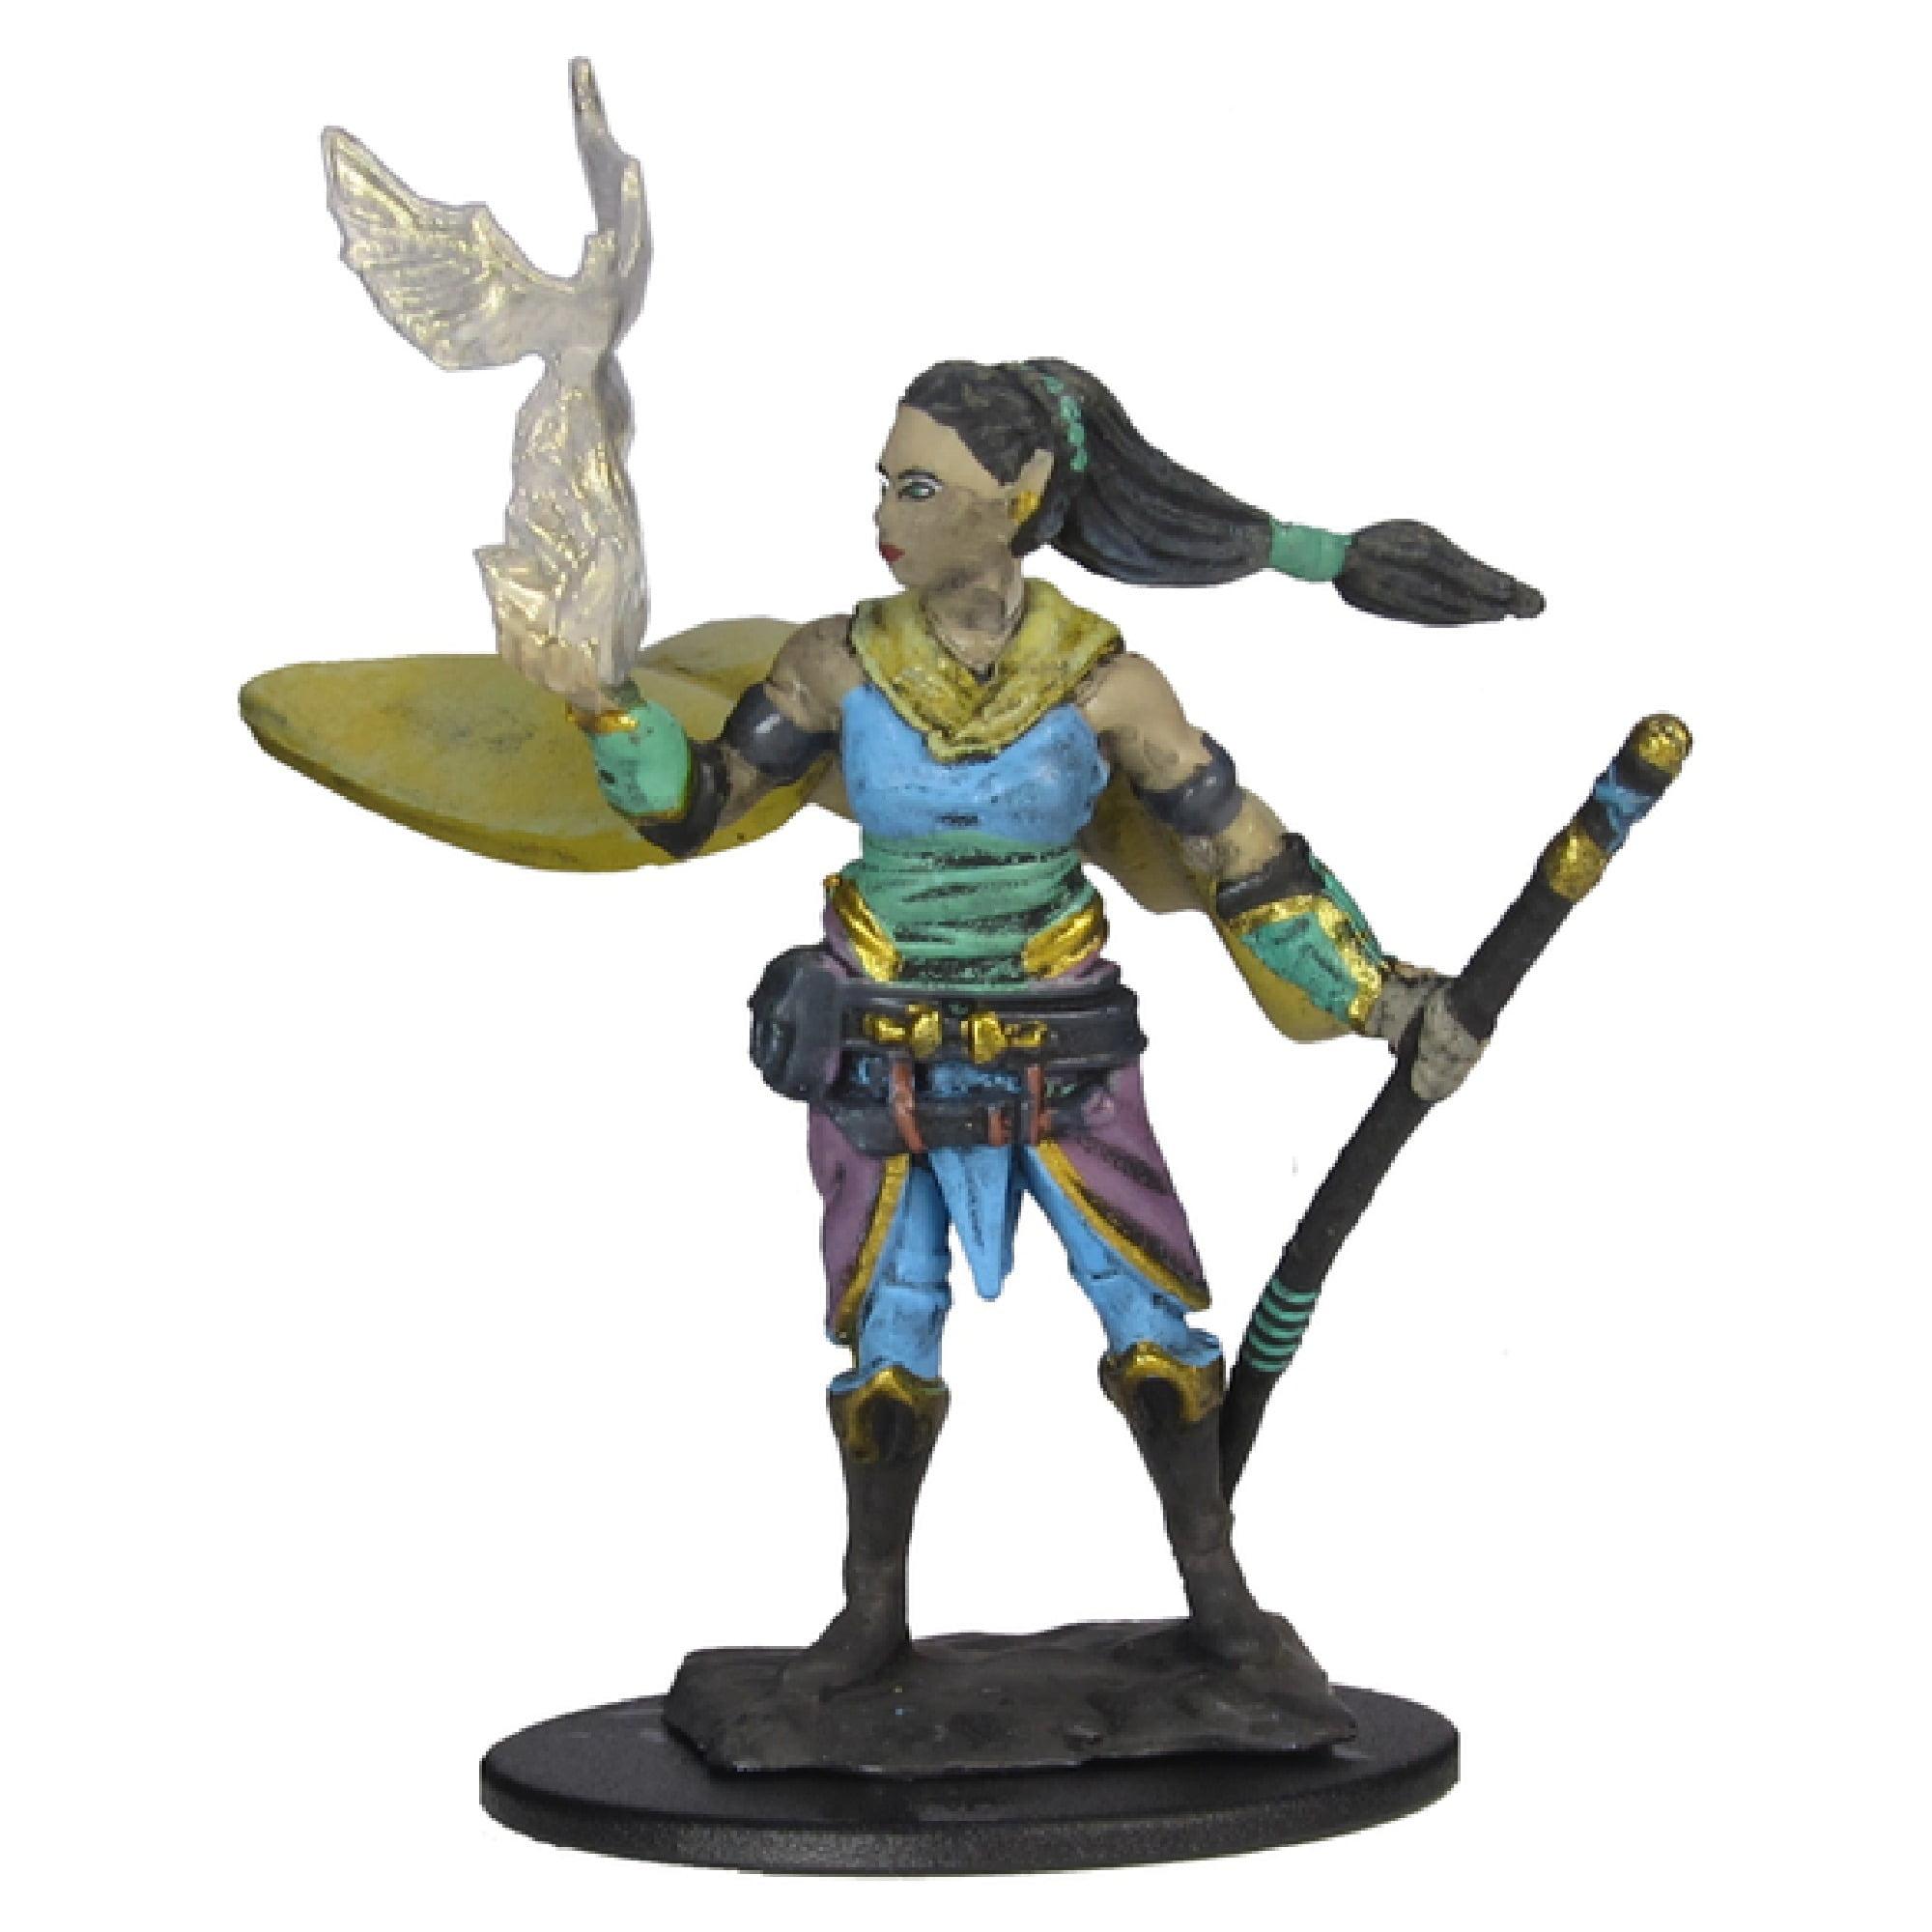 Dungeons & Dragons: Icons of the Realms - Elf Druid Female - Miniatura Premium